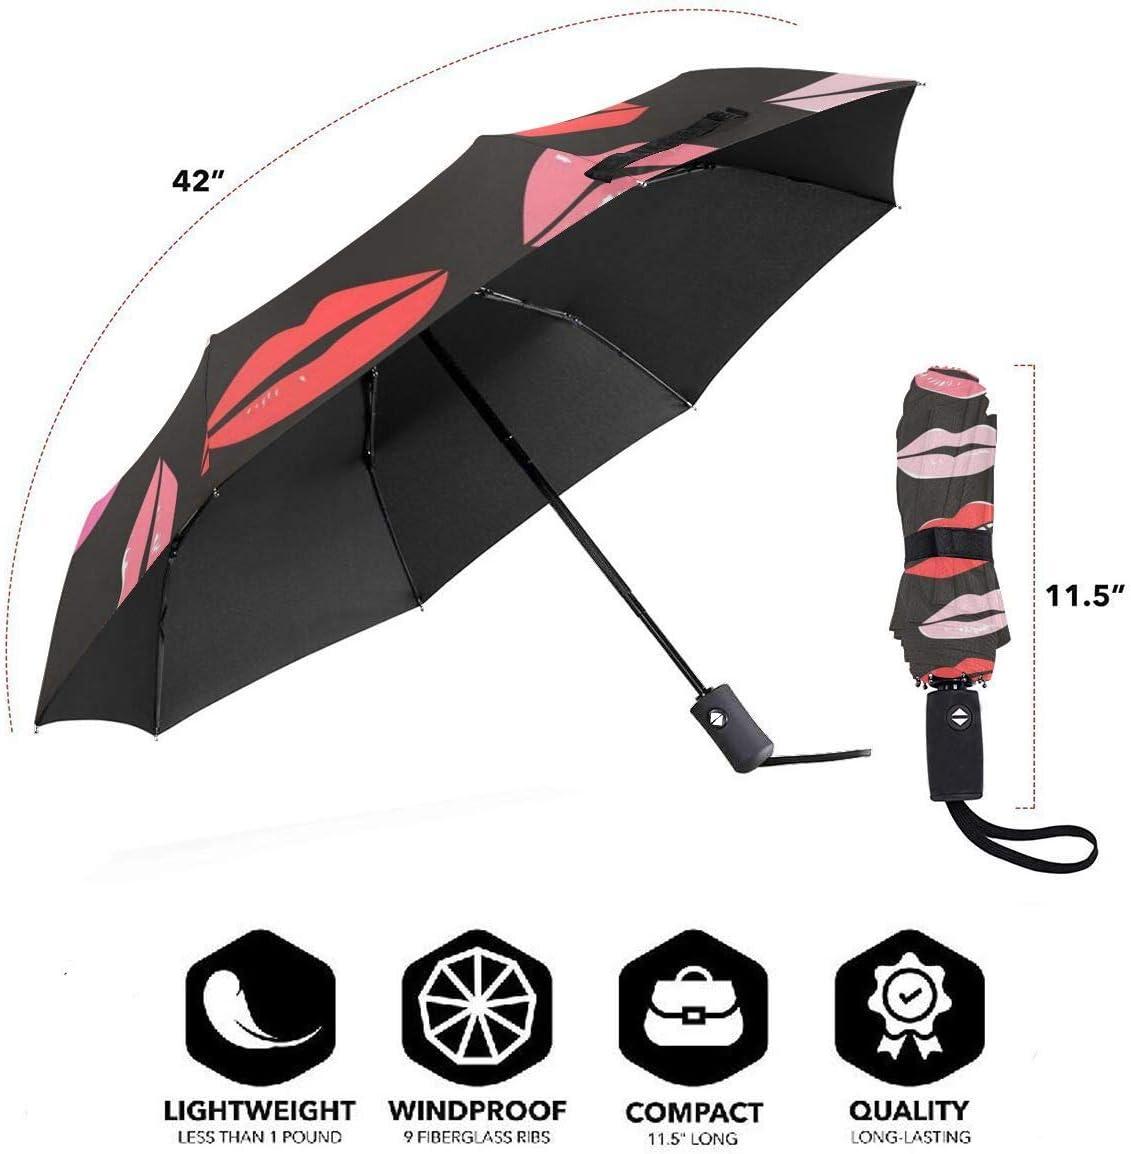 Valentines Lips Kiss Love Red Pink Umbrella Compact Rain/&Wind Repellent Umbrellas Sun Protection With Anti UV Coating Travel Auto Folding Umbrella